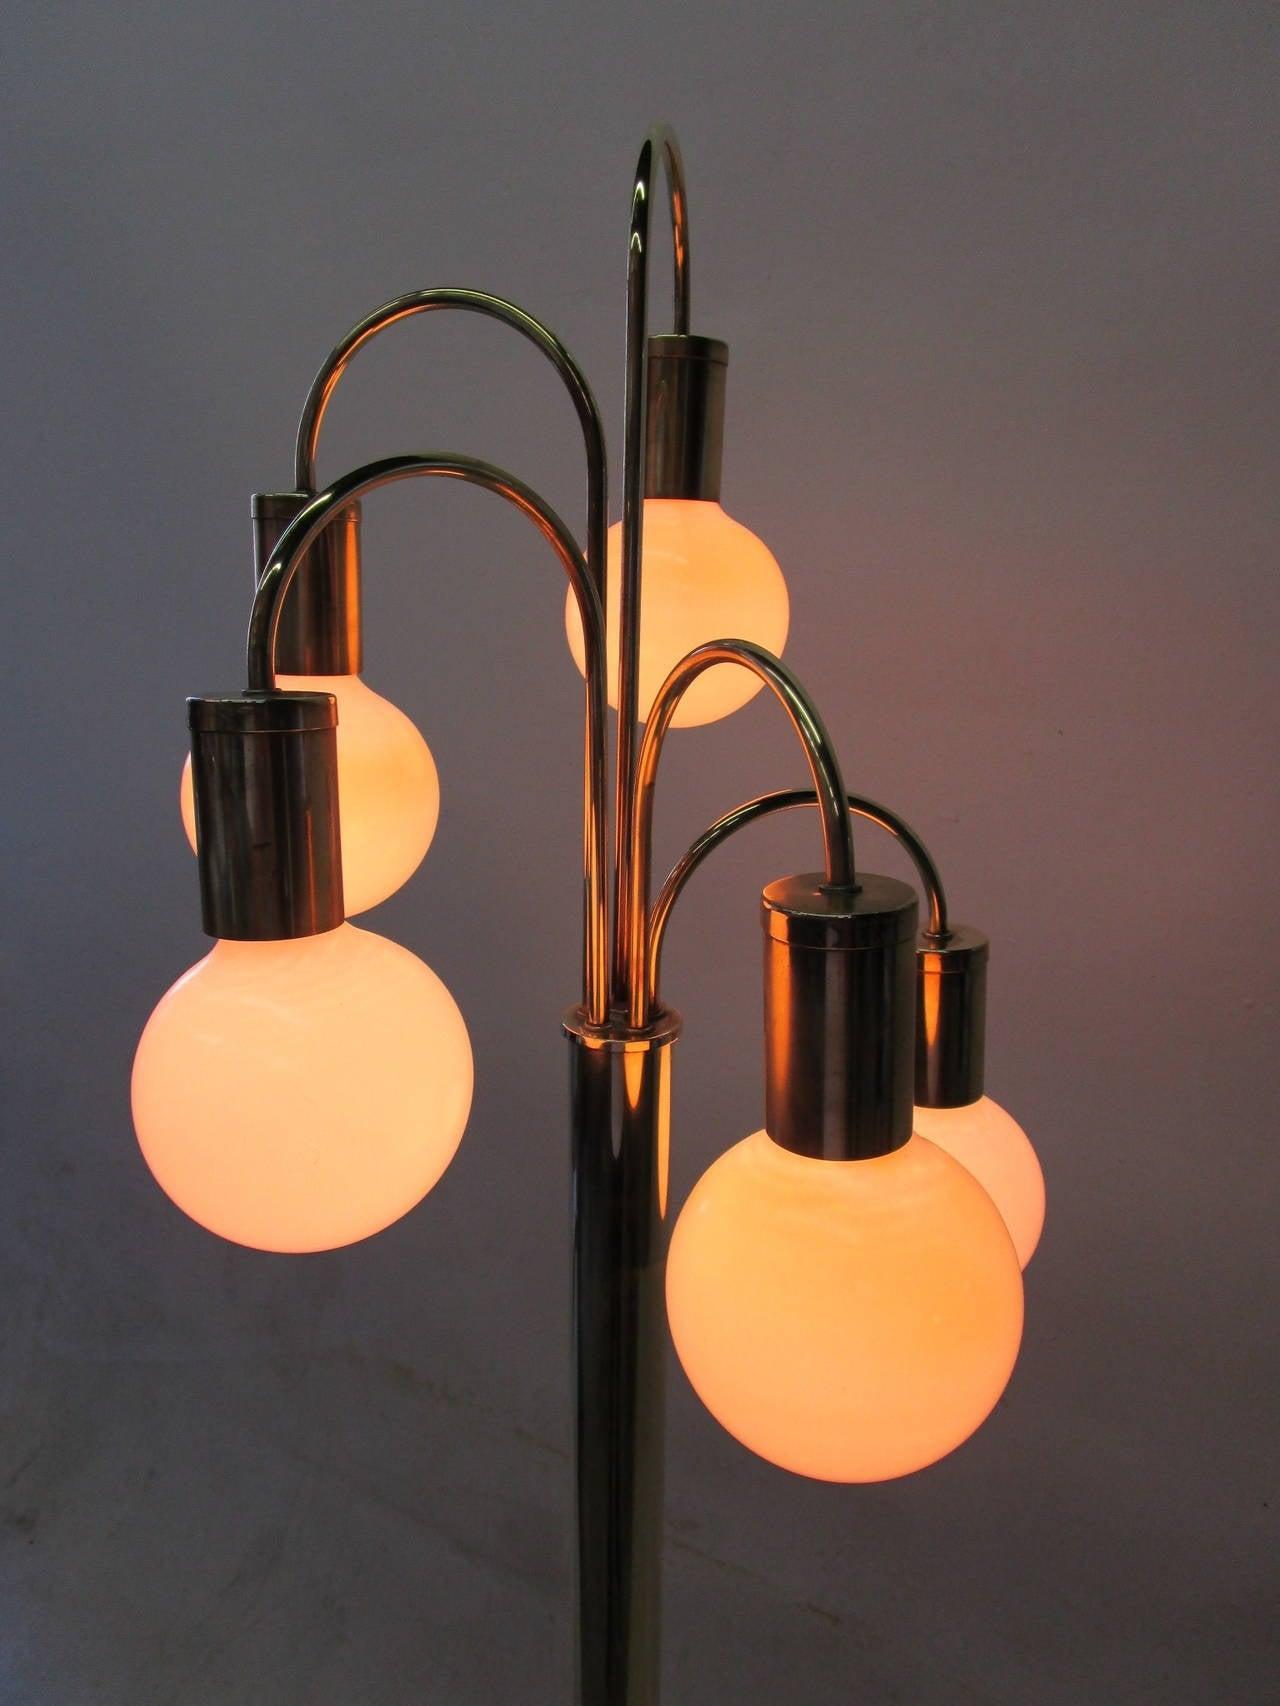 Waterfall Five-Arm Brass  Floor Lamp by Robert Sonneman 5